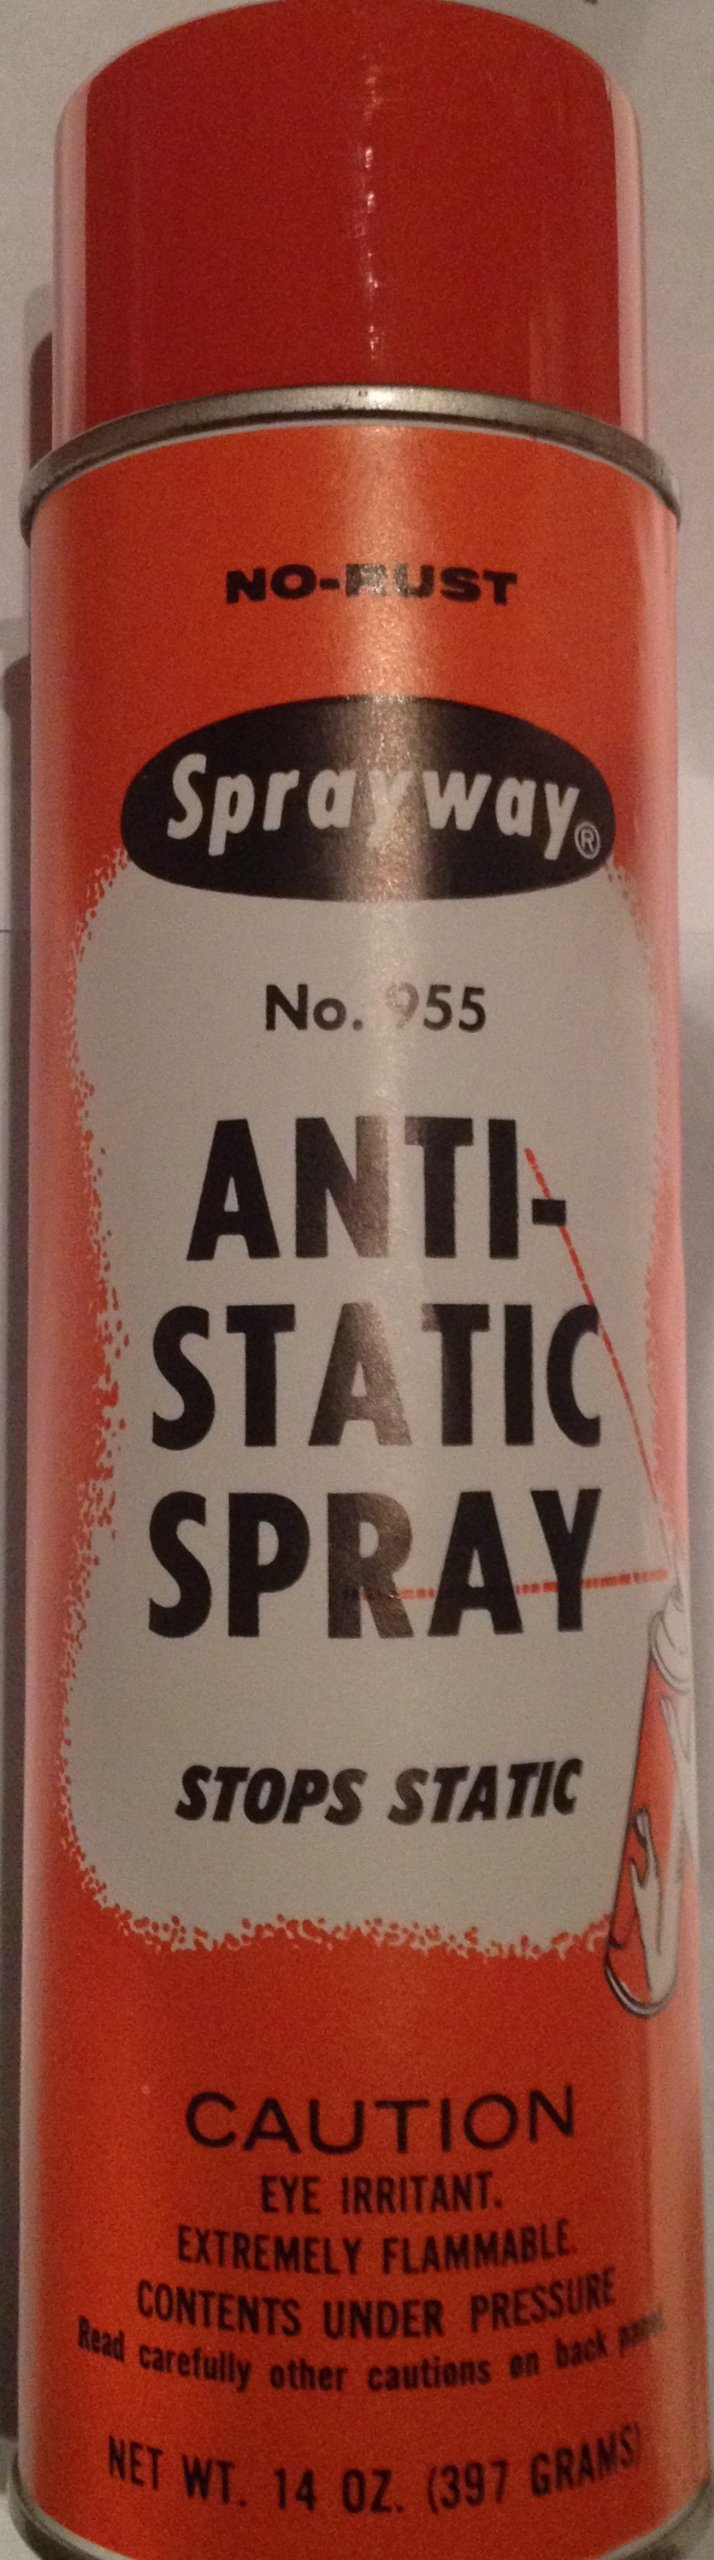 SPRAYWAY 955 - Anti-Static Spray 12/CASE